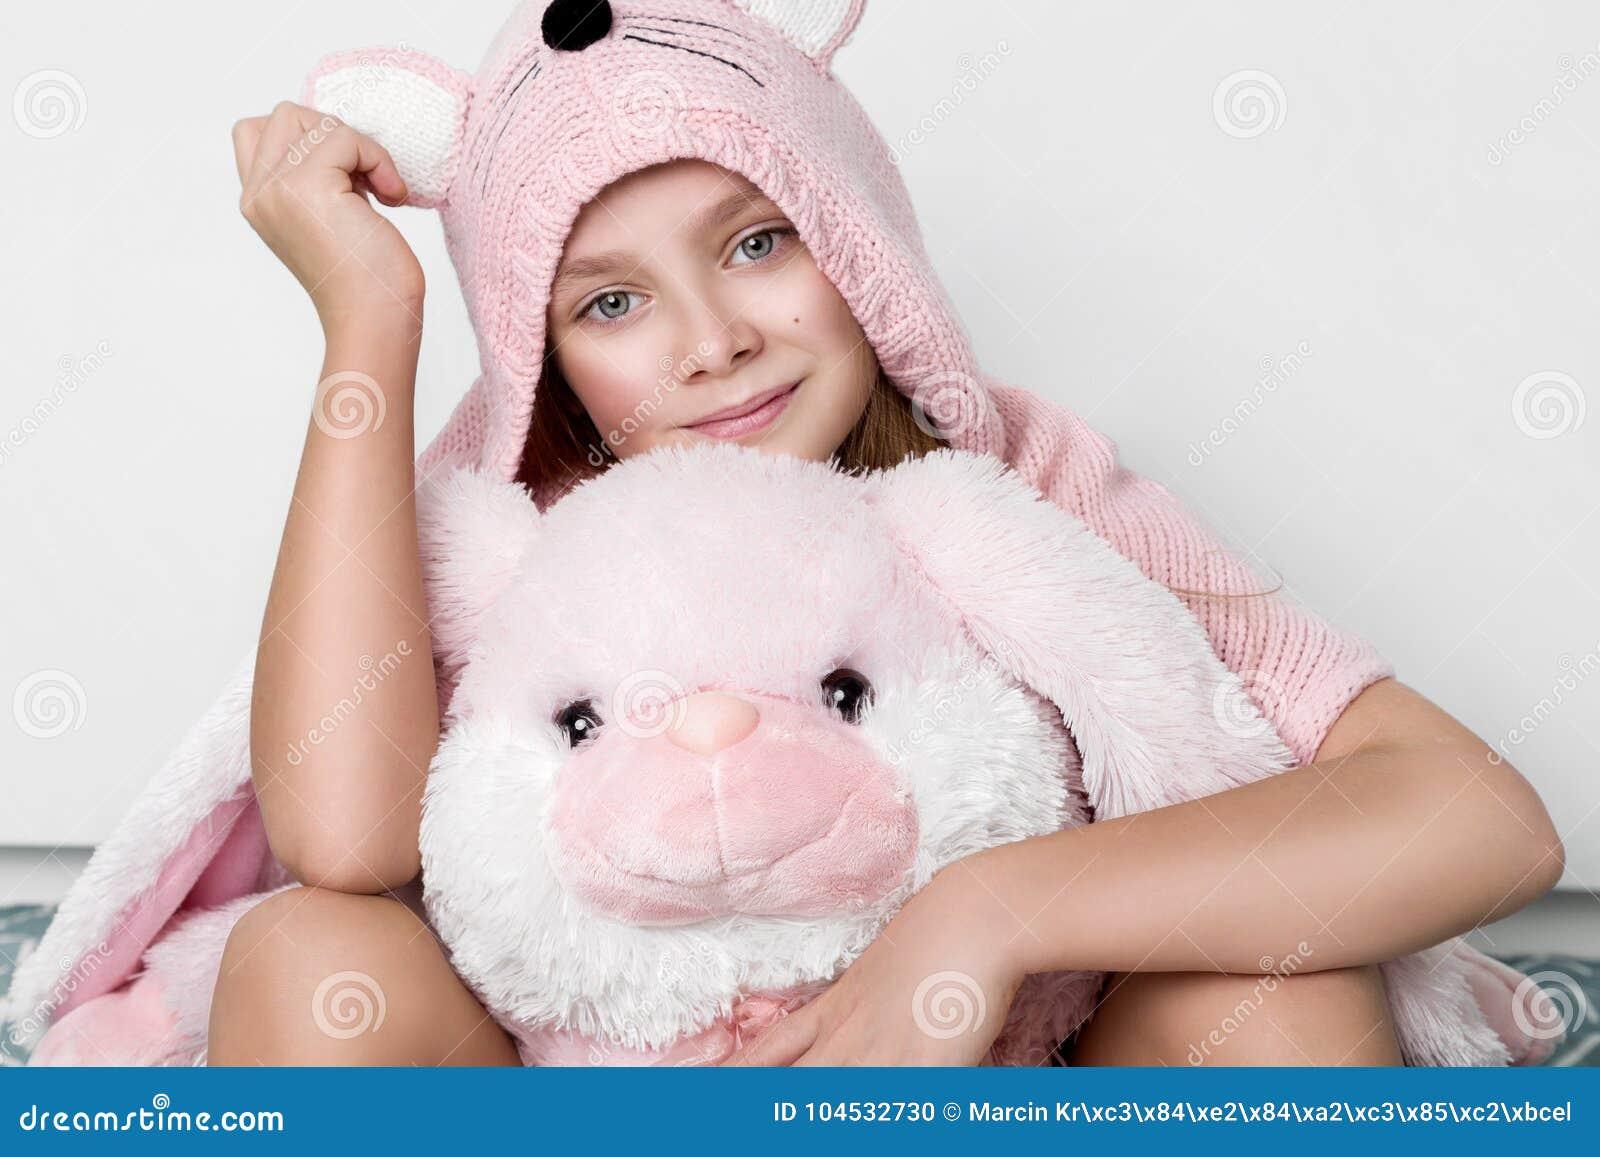 Pretty Little Girl Wearing A Warm Sweater With Rabbit Ears Sitting